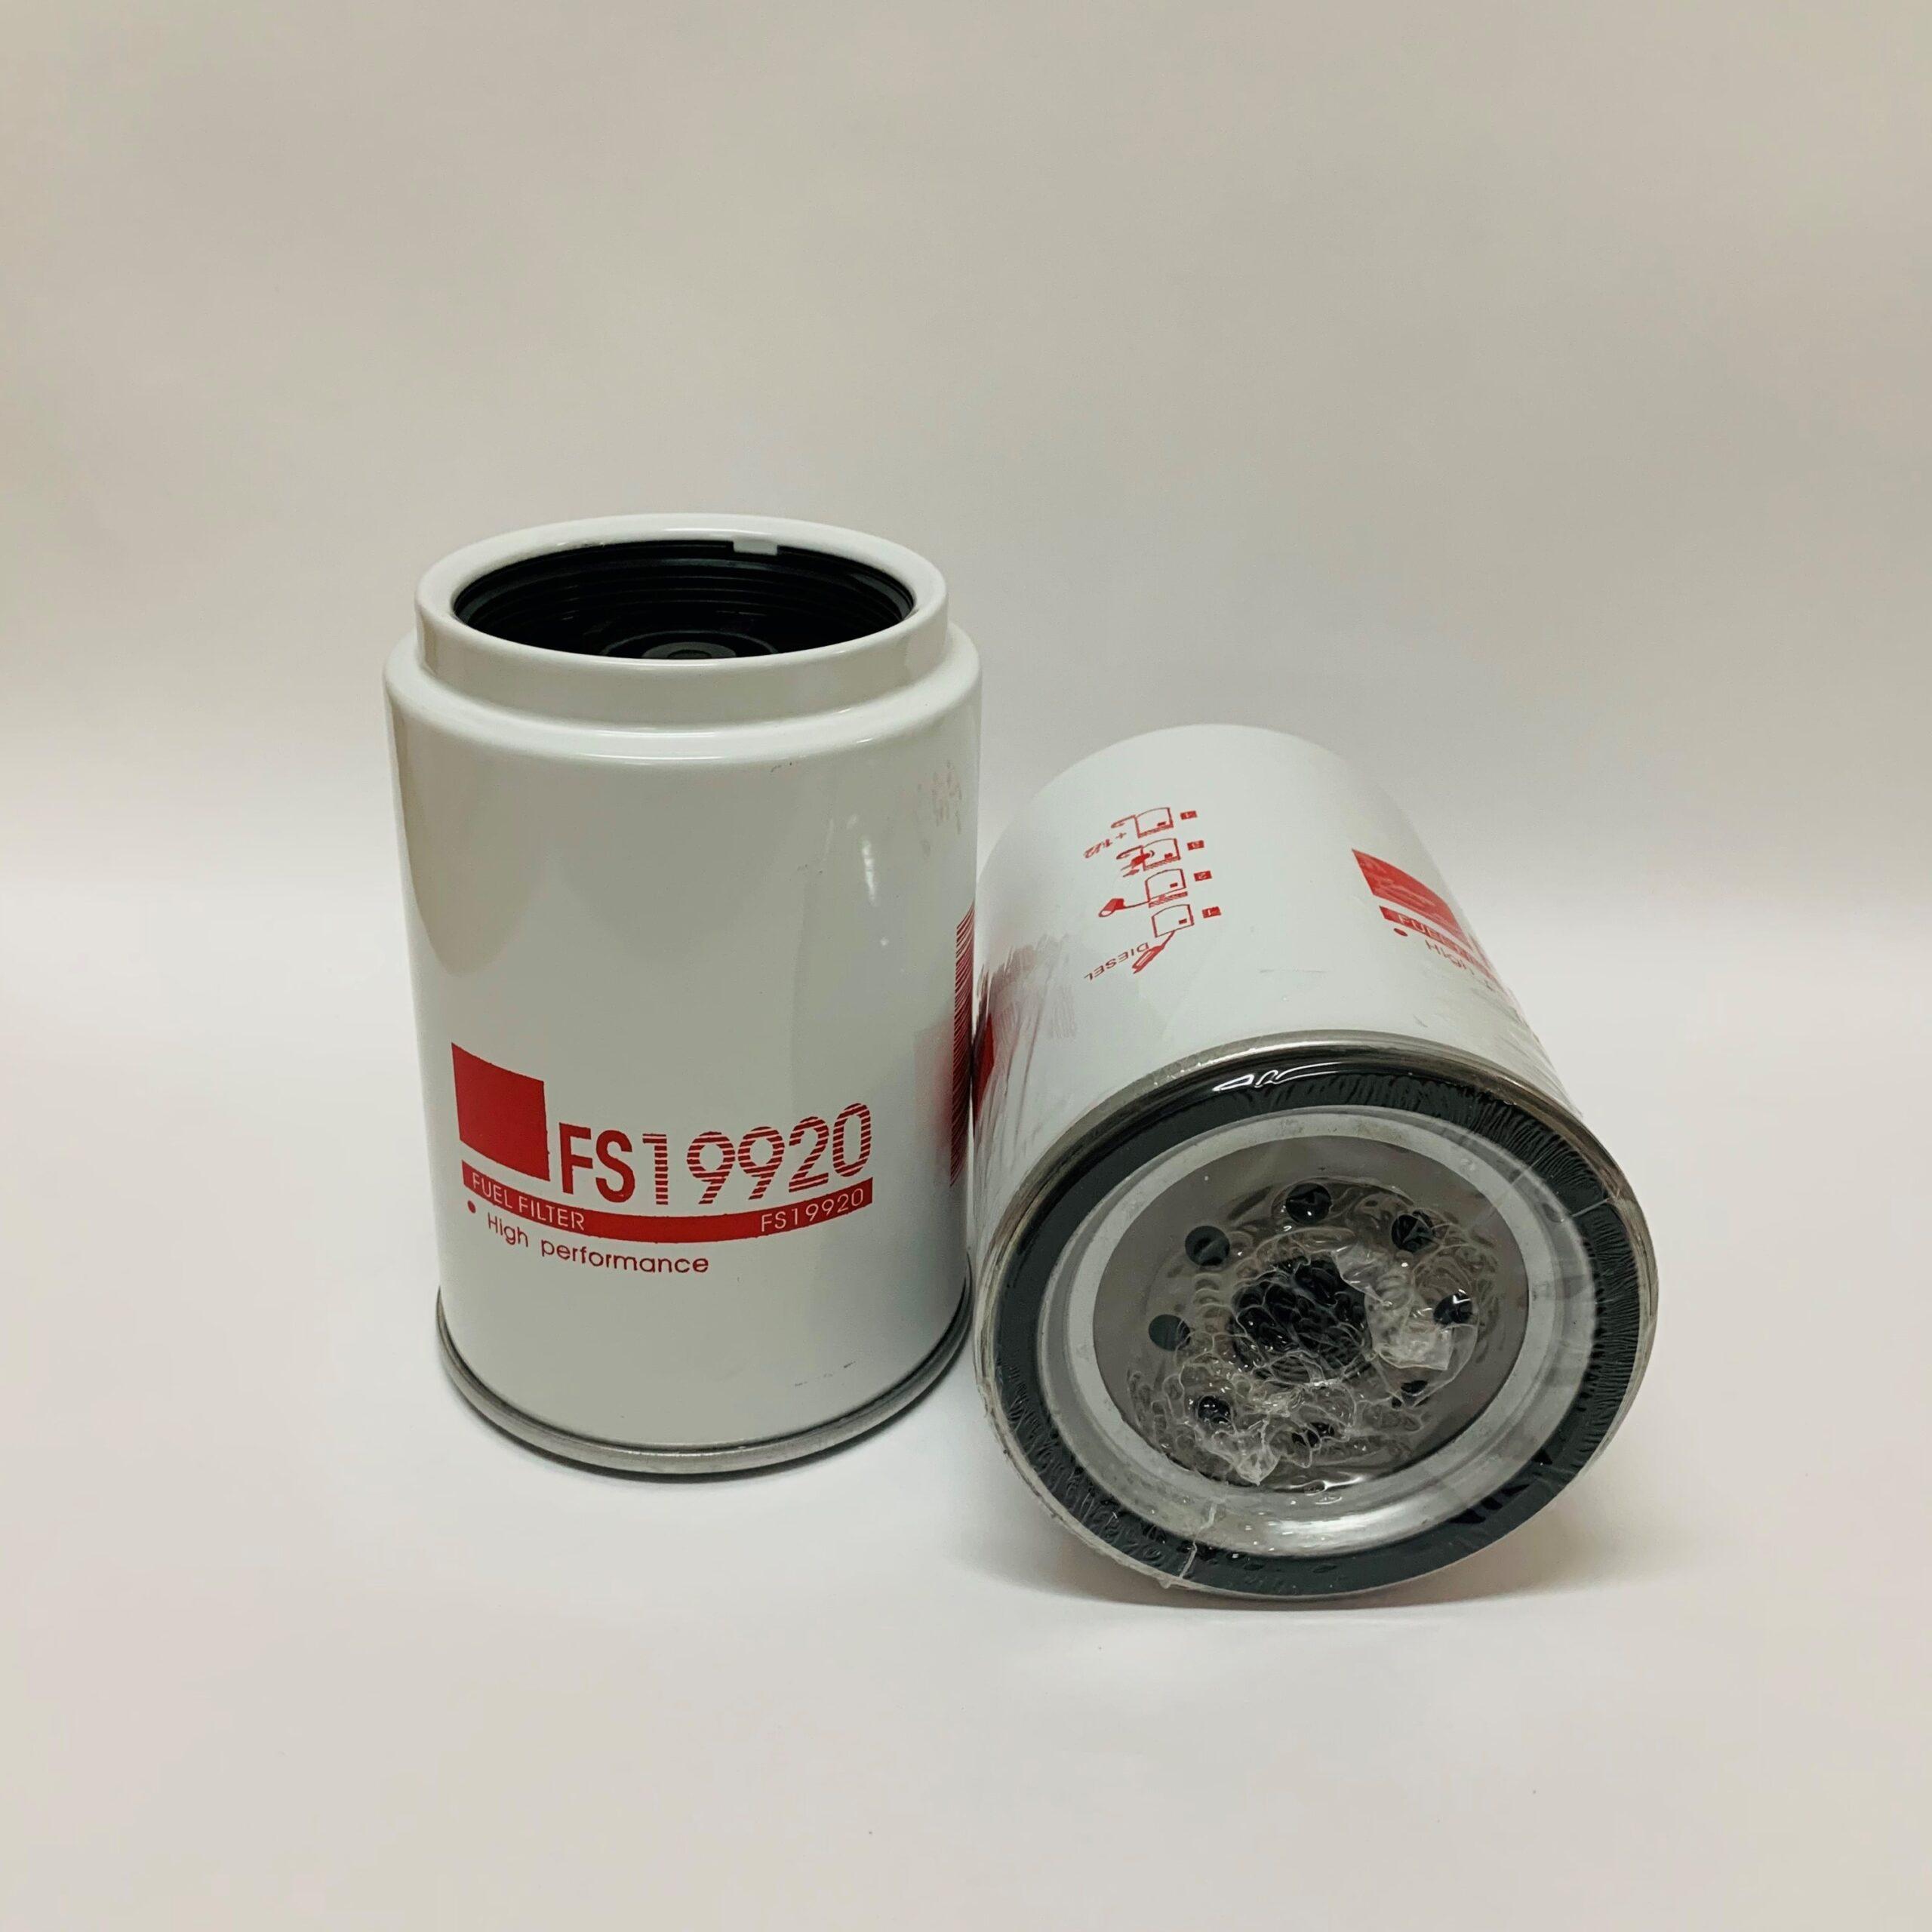 FS19920